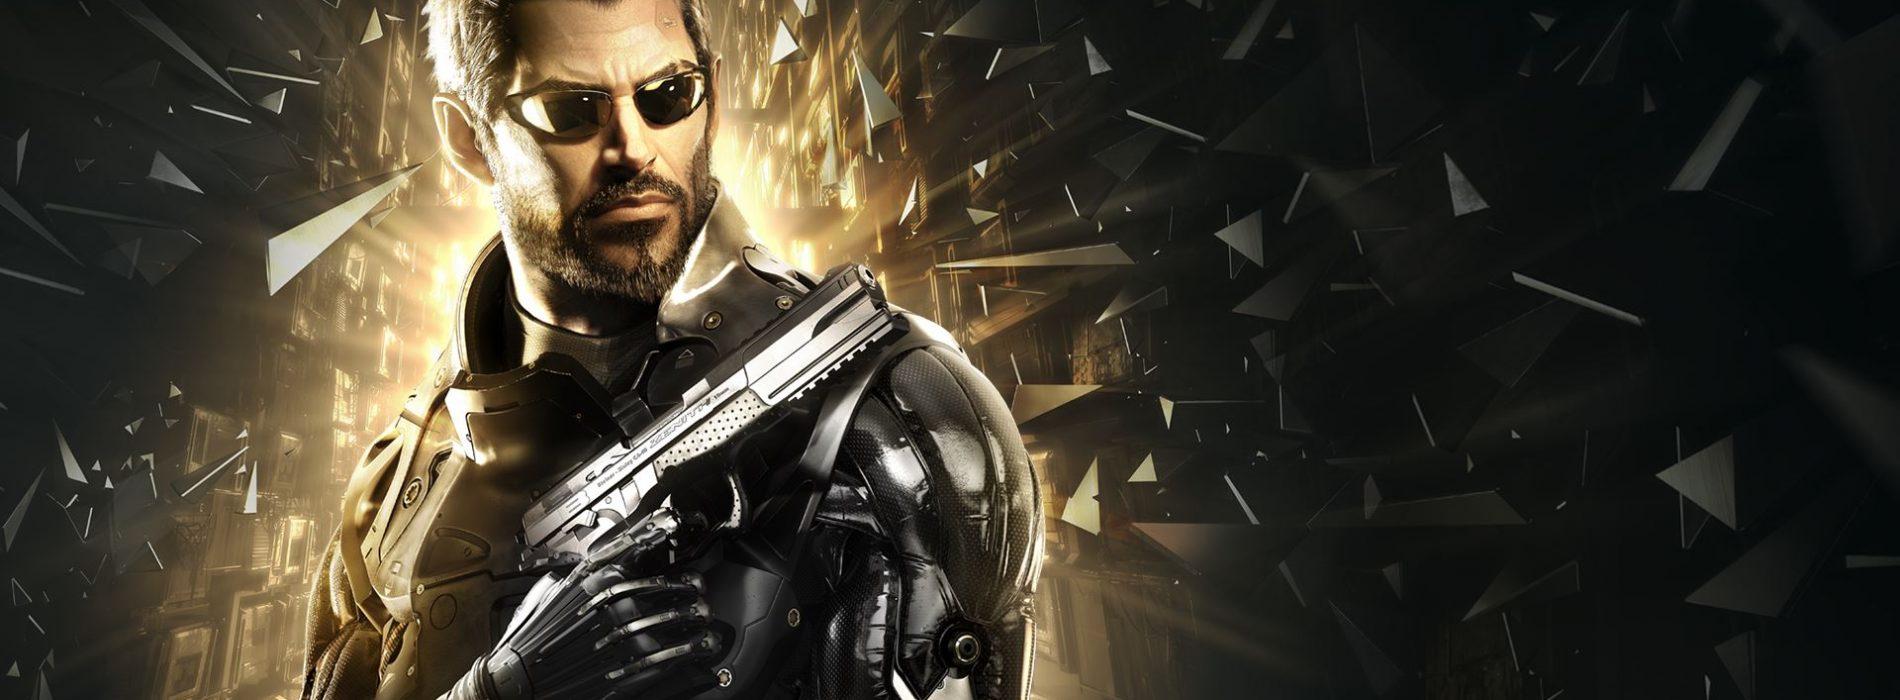 Deus Ex : Mankind Divided, action…discrète!